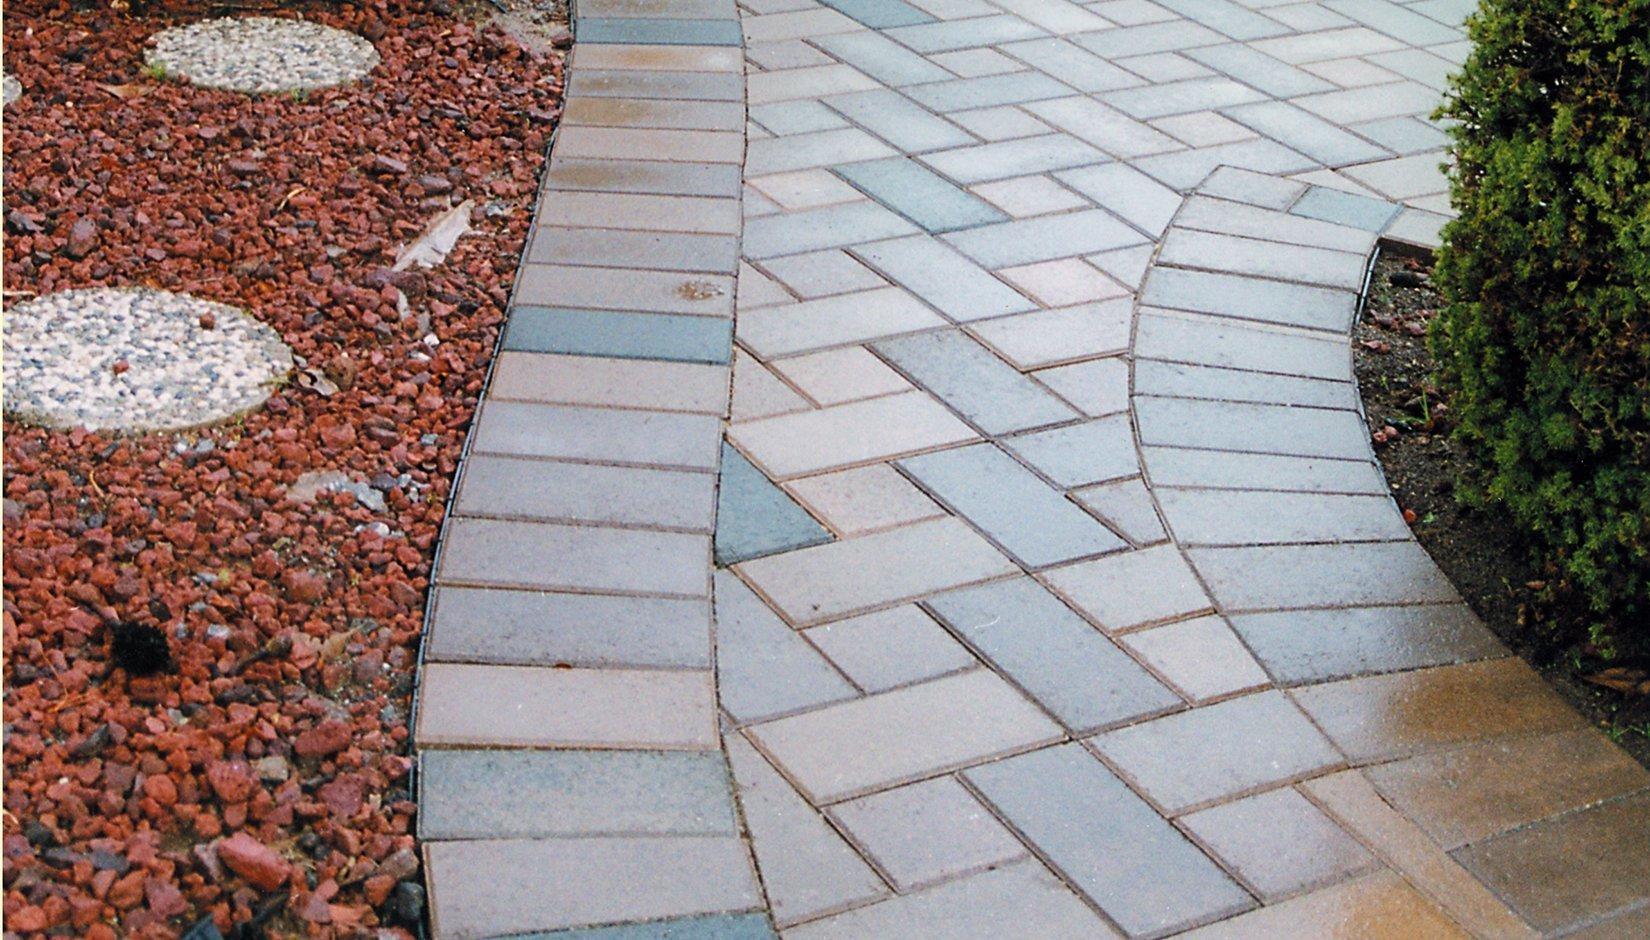 Pacific Interlock Paving Stone : Hydro flo™ estate pavers pacific interlock pavingstone